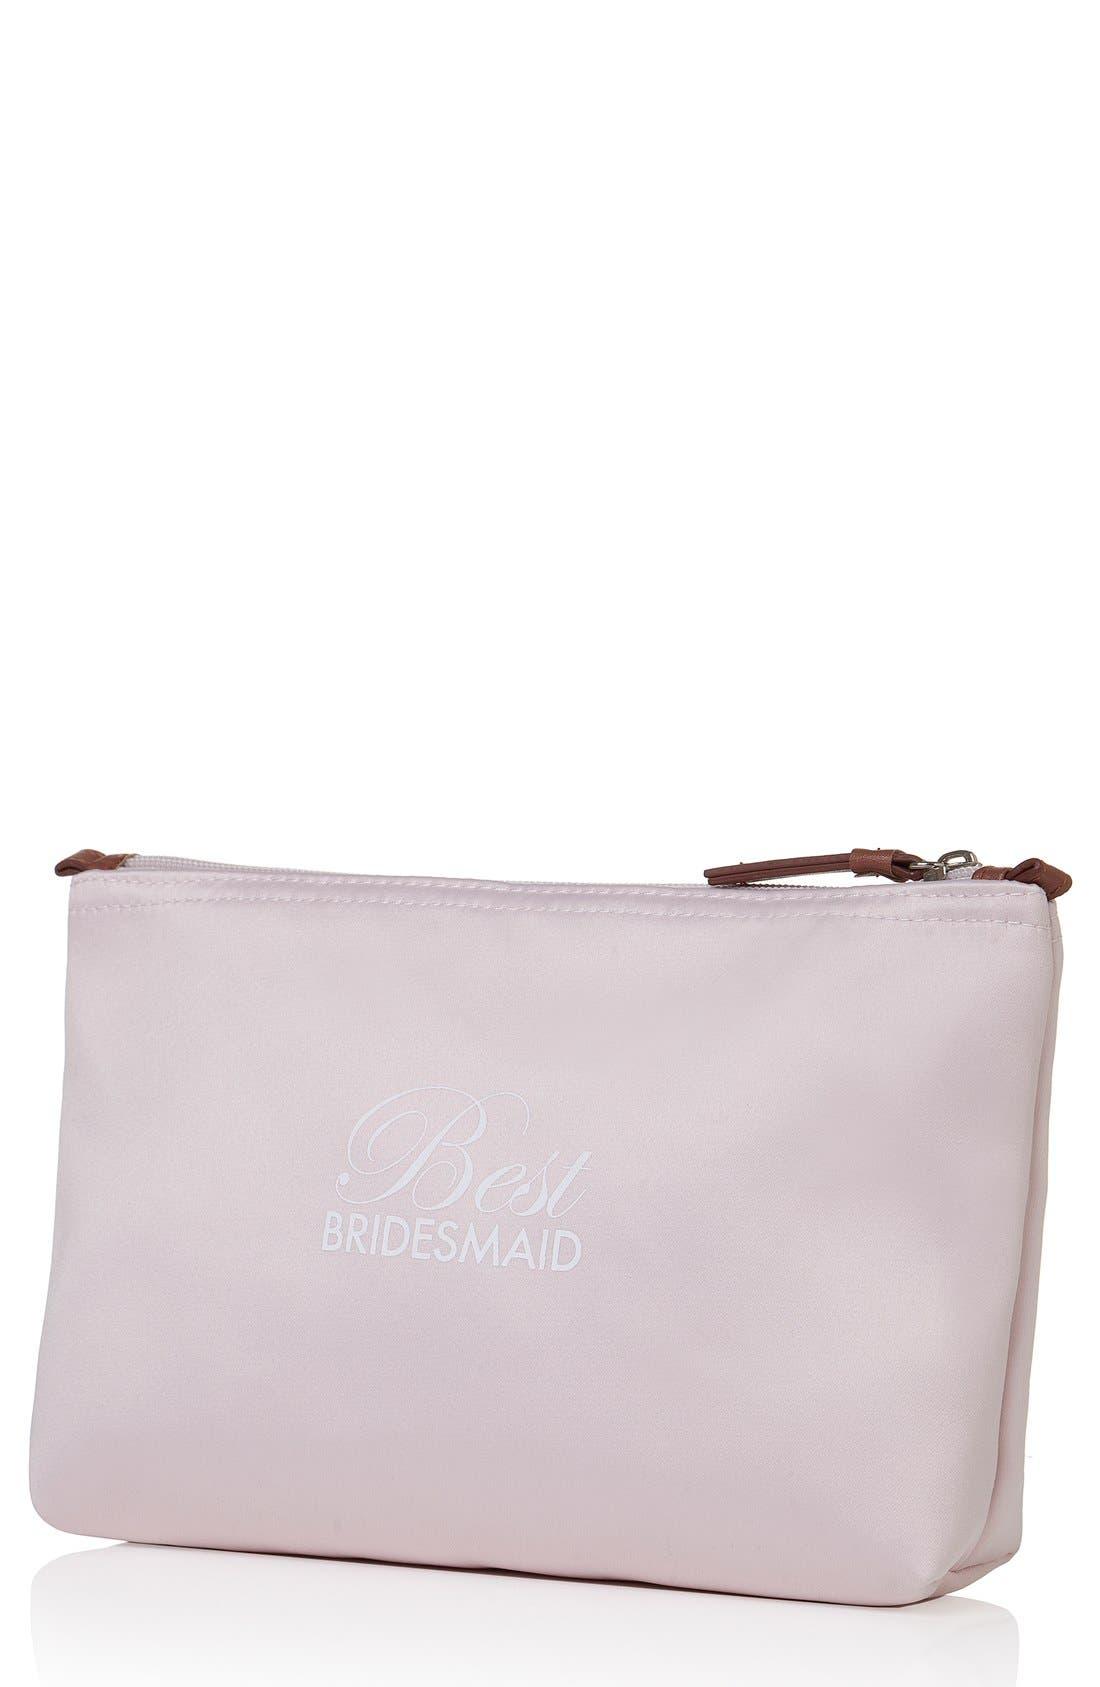 'Best Bridesmaid' Cosmetics Bag,                         Main,                         color, BLUSH